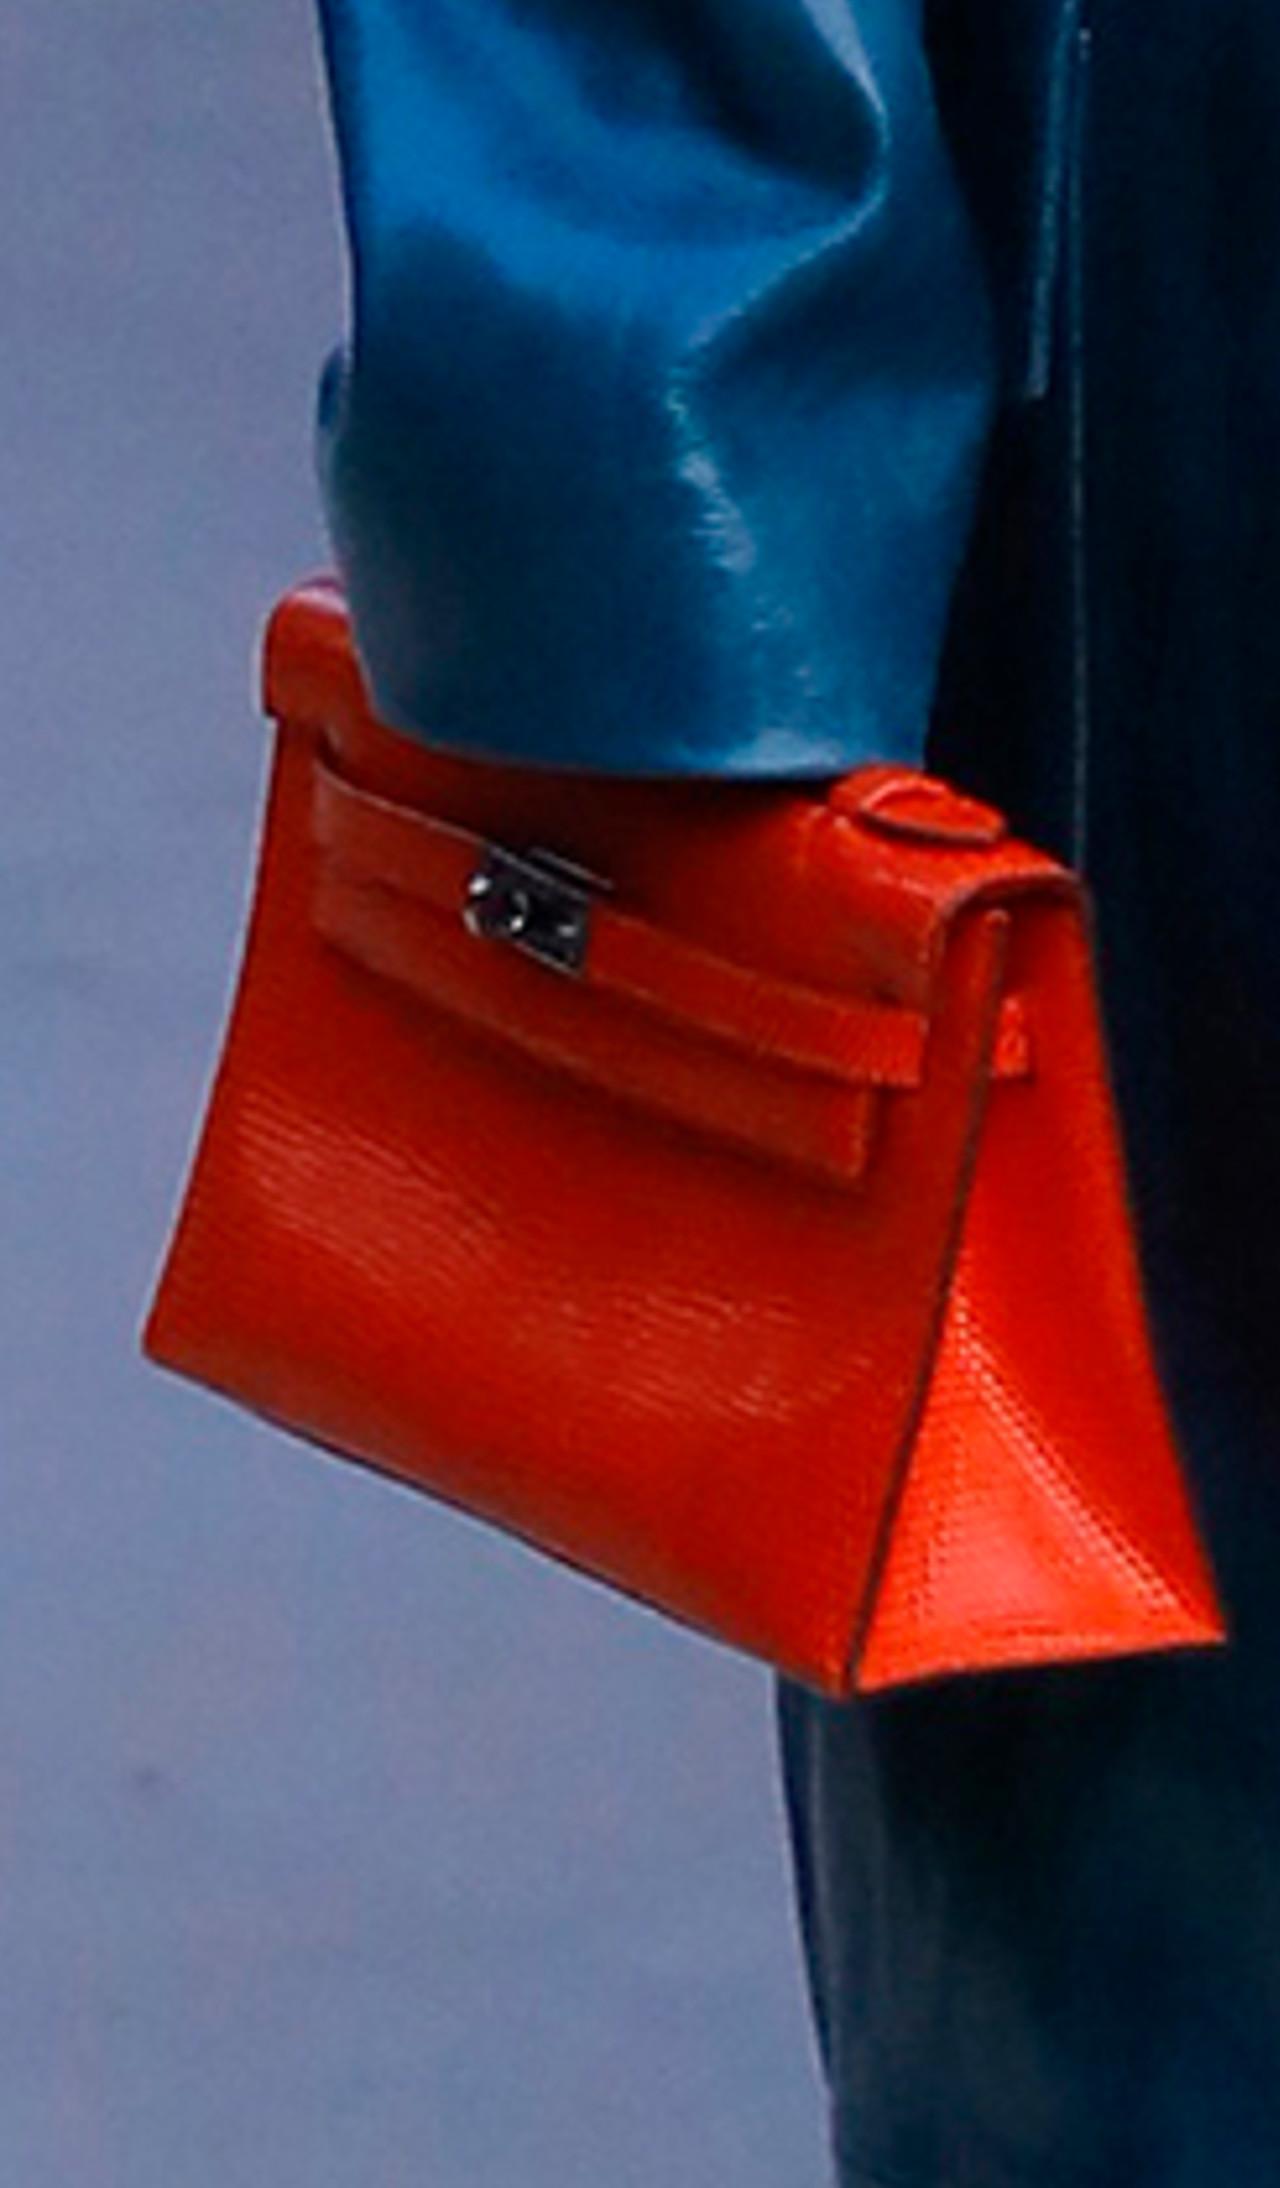 Kim Kardashian z torebką Hermes.